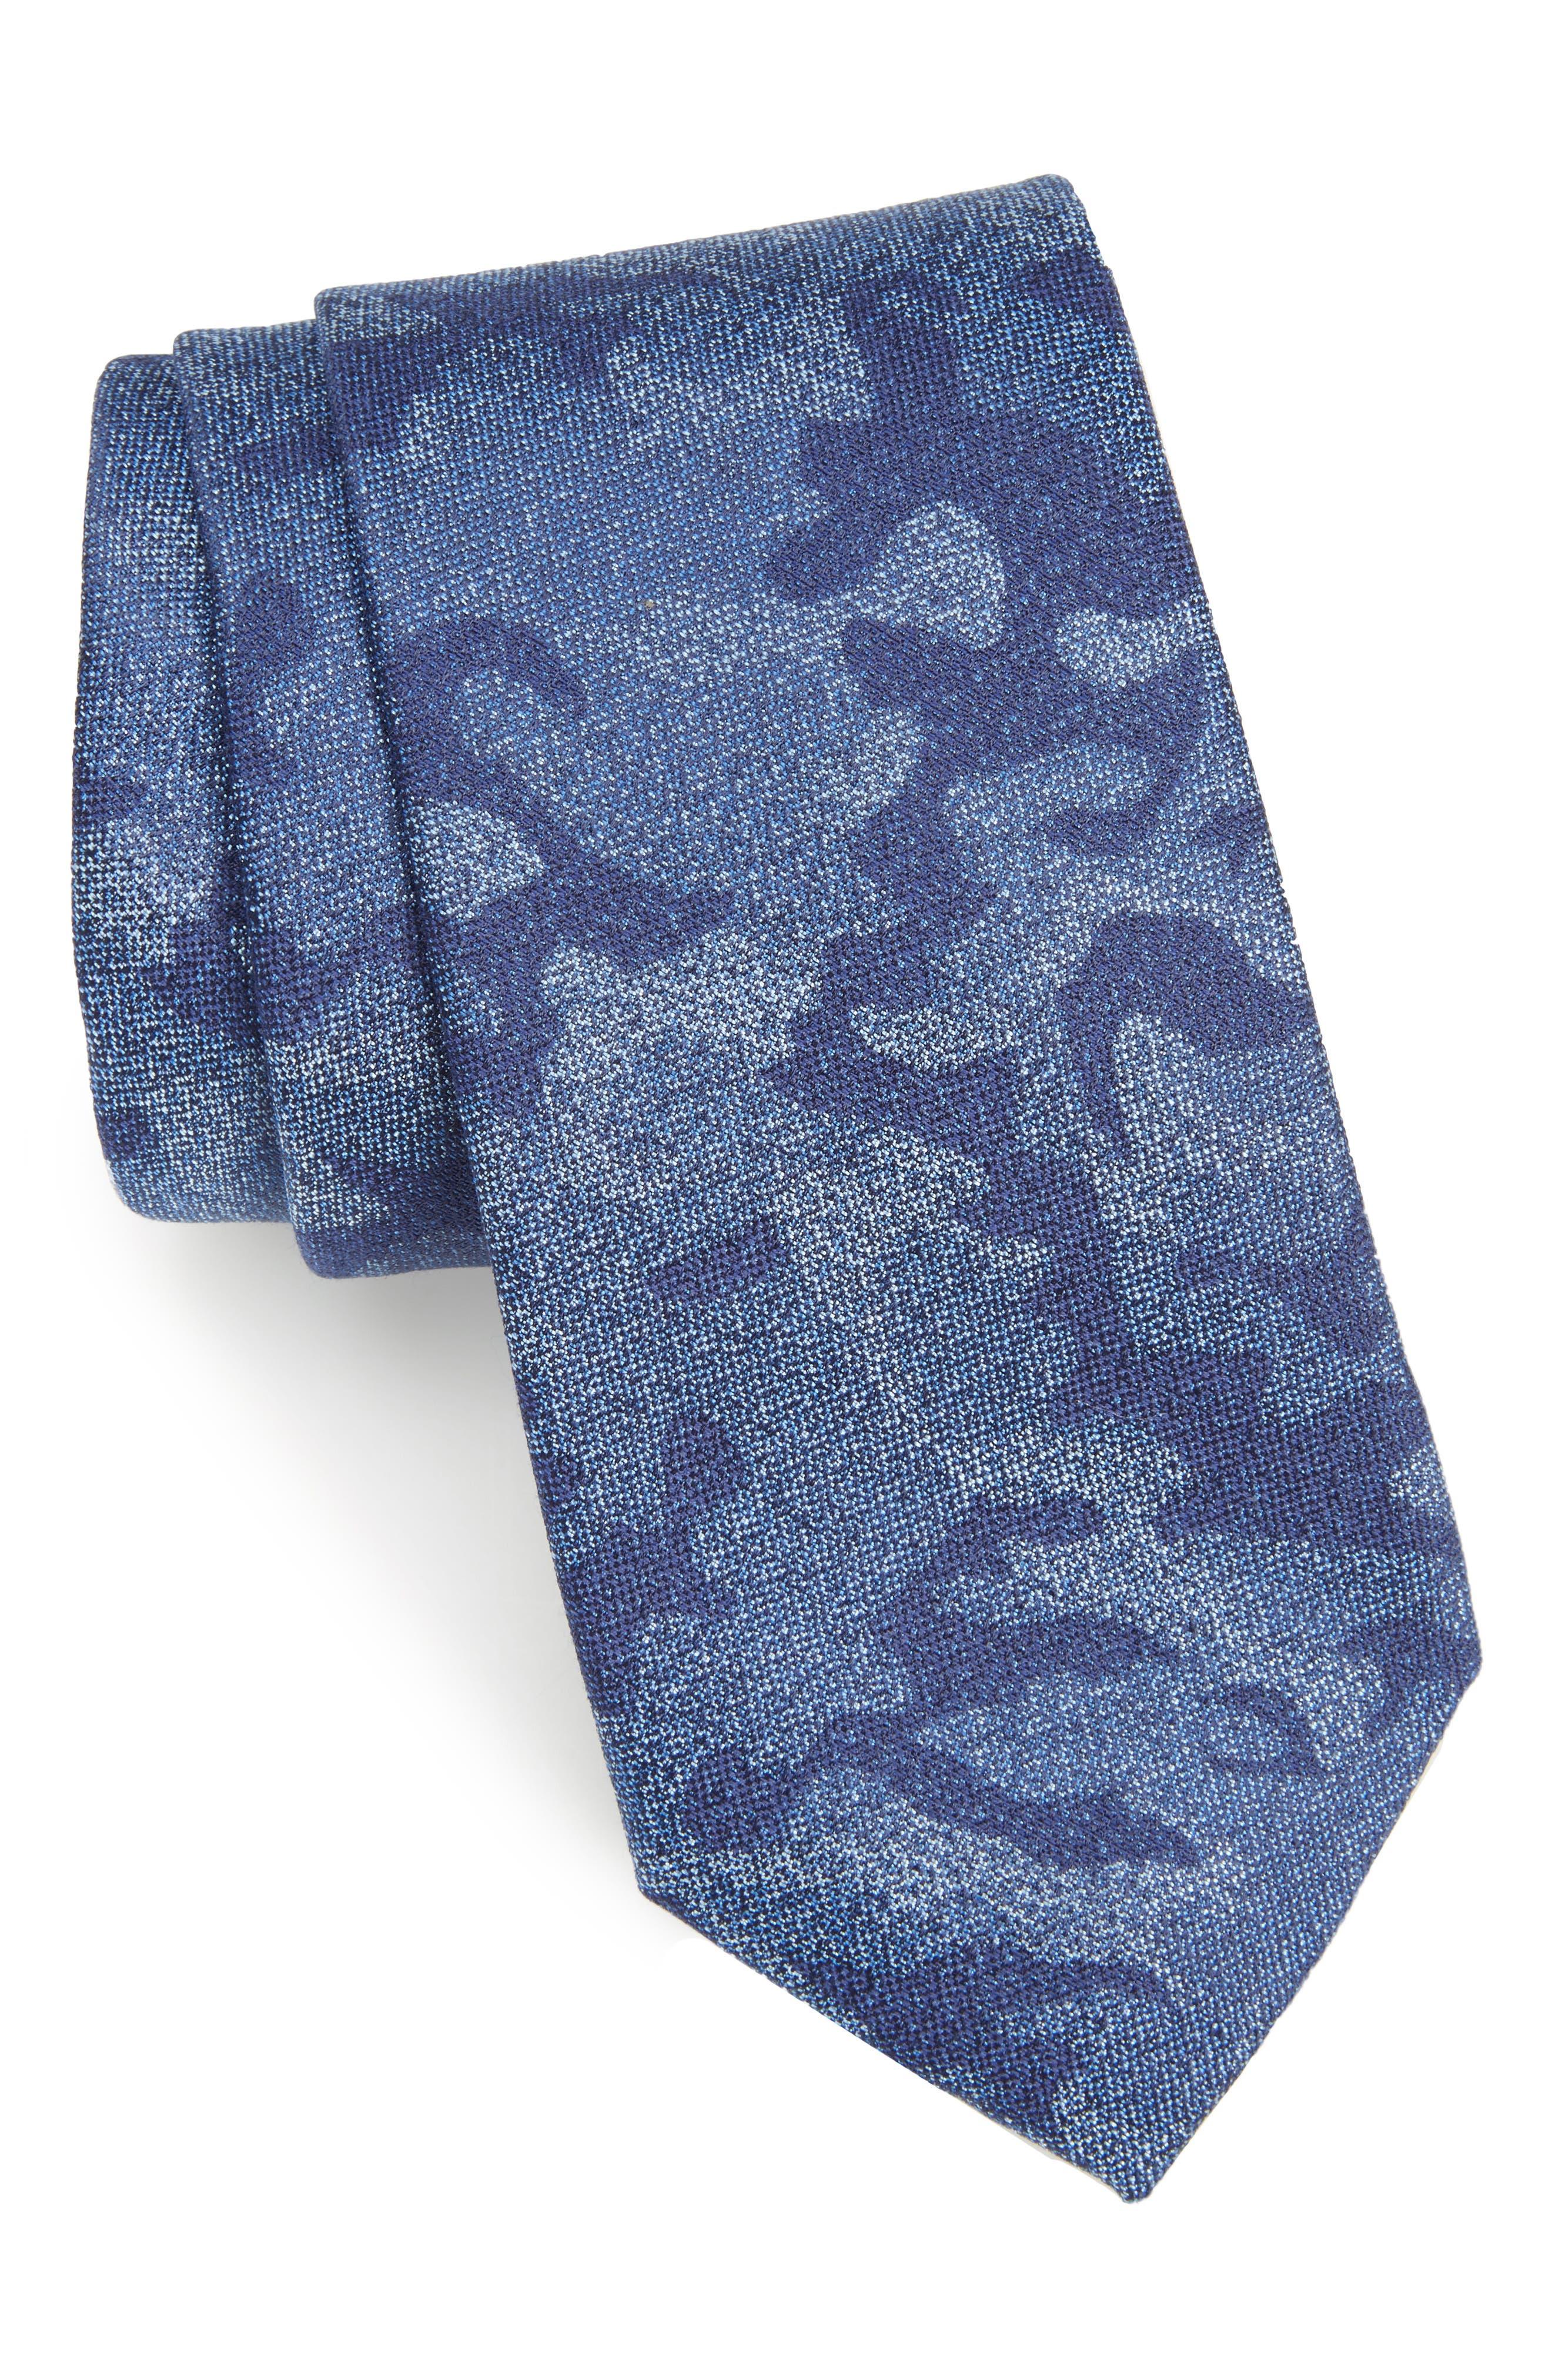 Alternate Image 1 Selected - Calibrate Morada Camo Silk & Cotton Tie